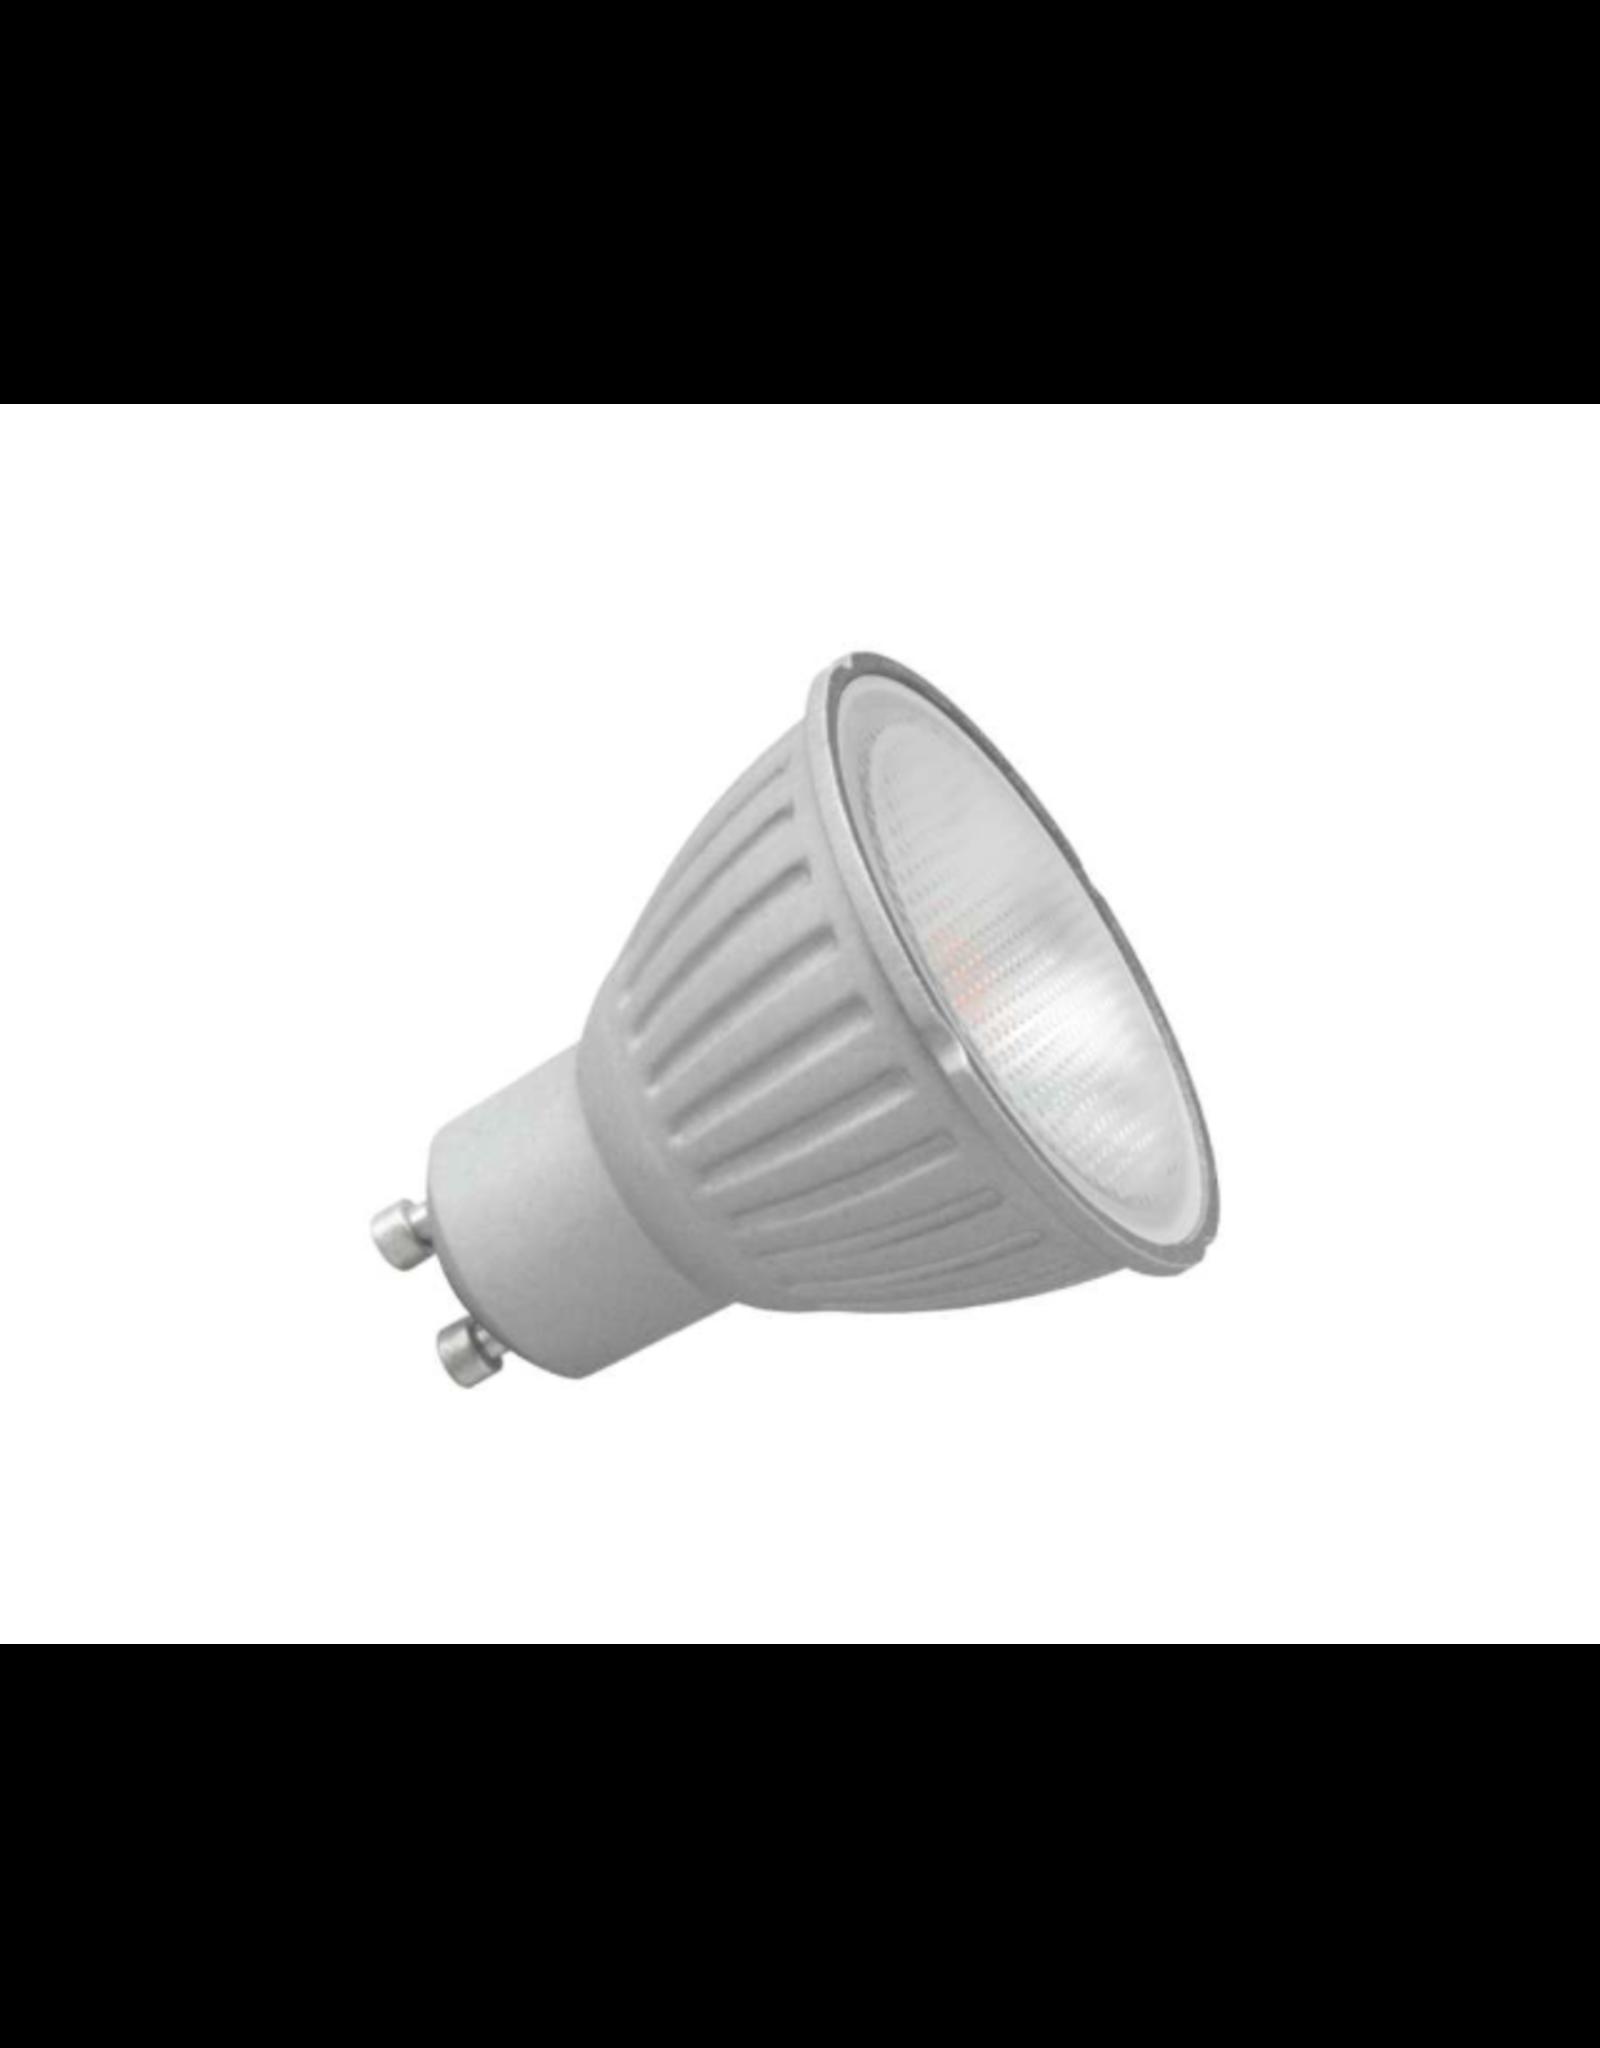 Led Spot - GU10 - dimbaar - warm wit - 5 watt (380lm)